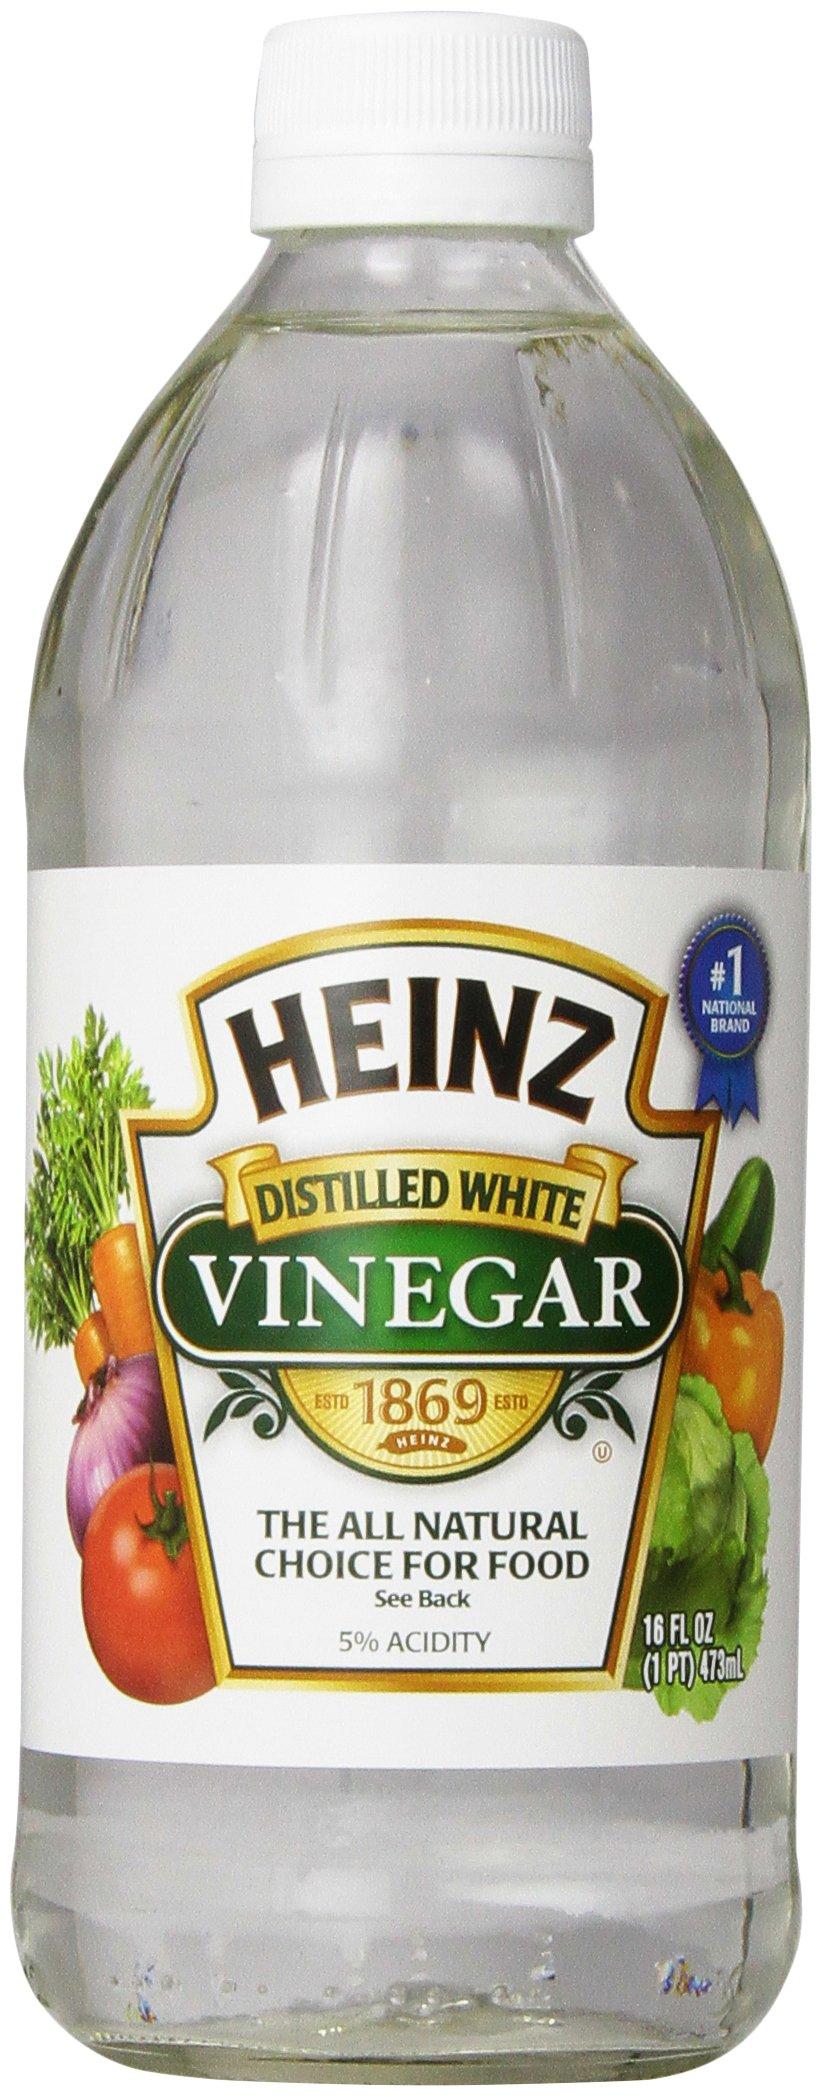 Heinz Distilled White Vinegar (15 oz Bottle) 1 Premium distilled white vinegar for all your recipe needs Sourced from sun-ripened corn All-Natural Ingredients